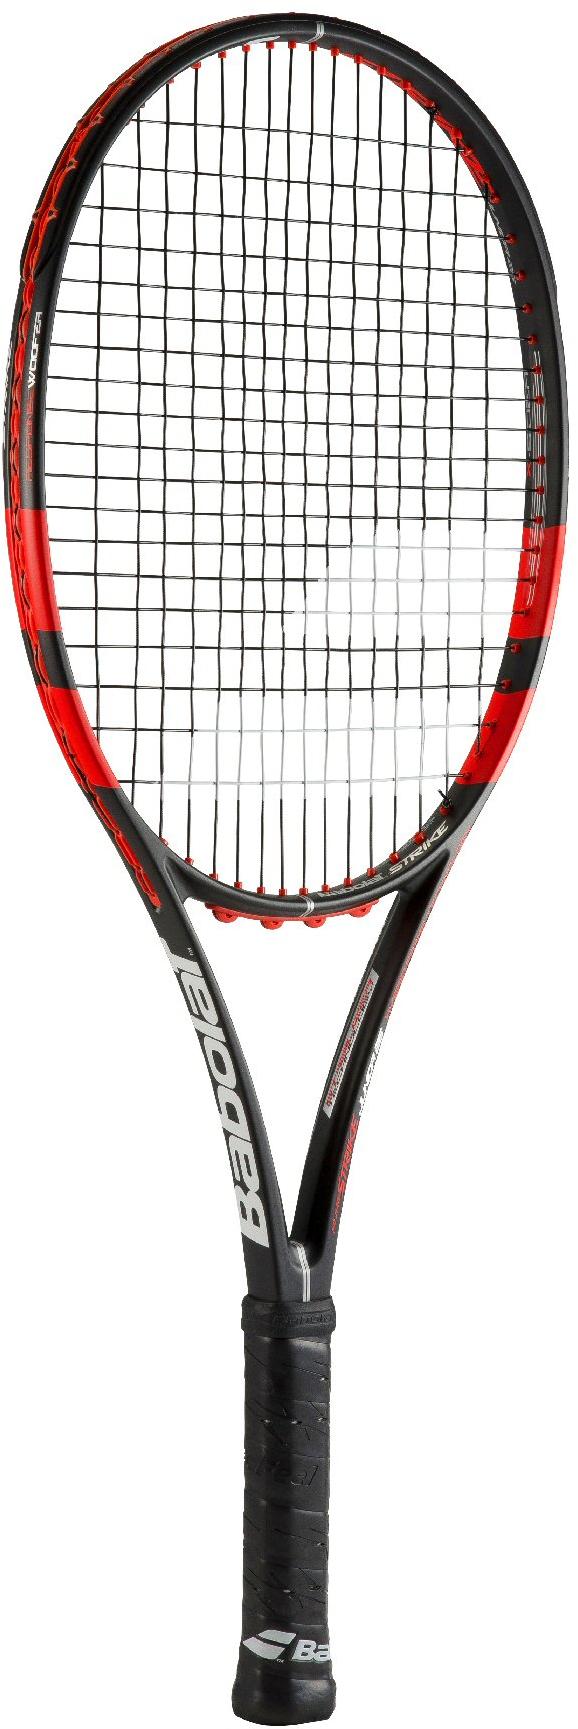 babolat pure strike jr 26 tennis racquet from do it tennis. Black Bedroom Furniture Sets. Home Design Ideas